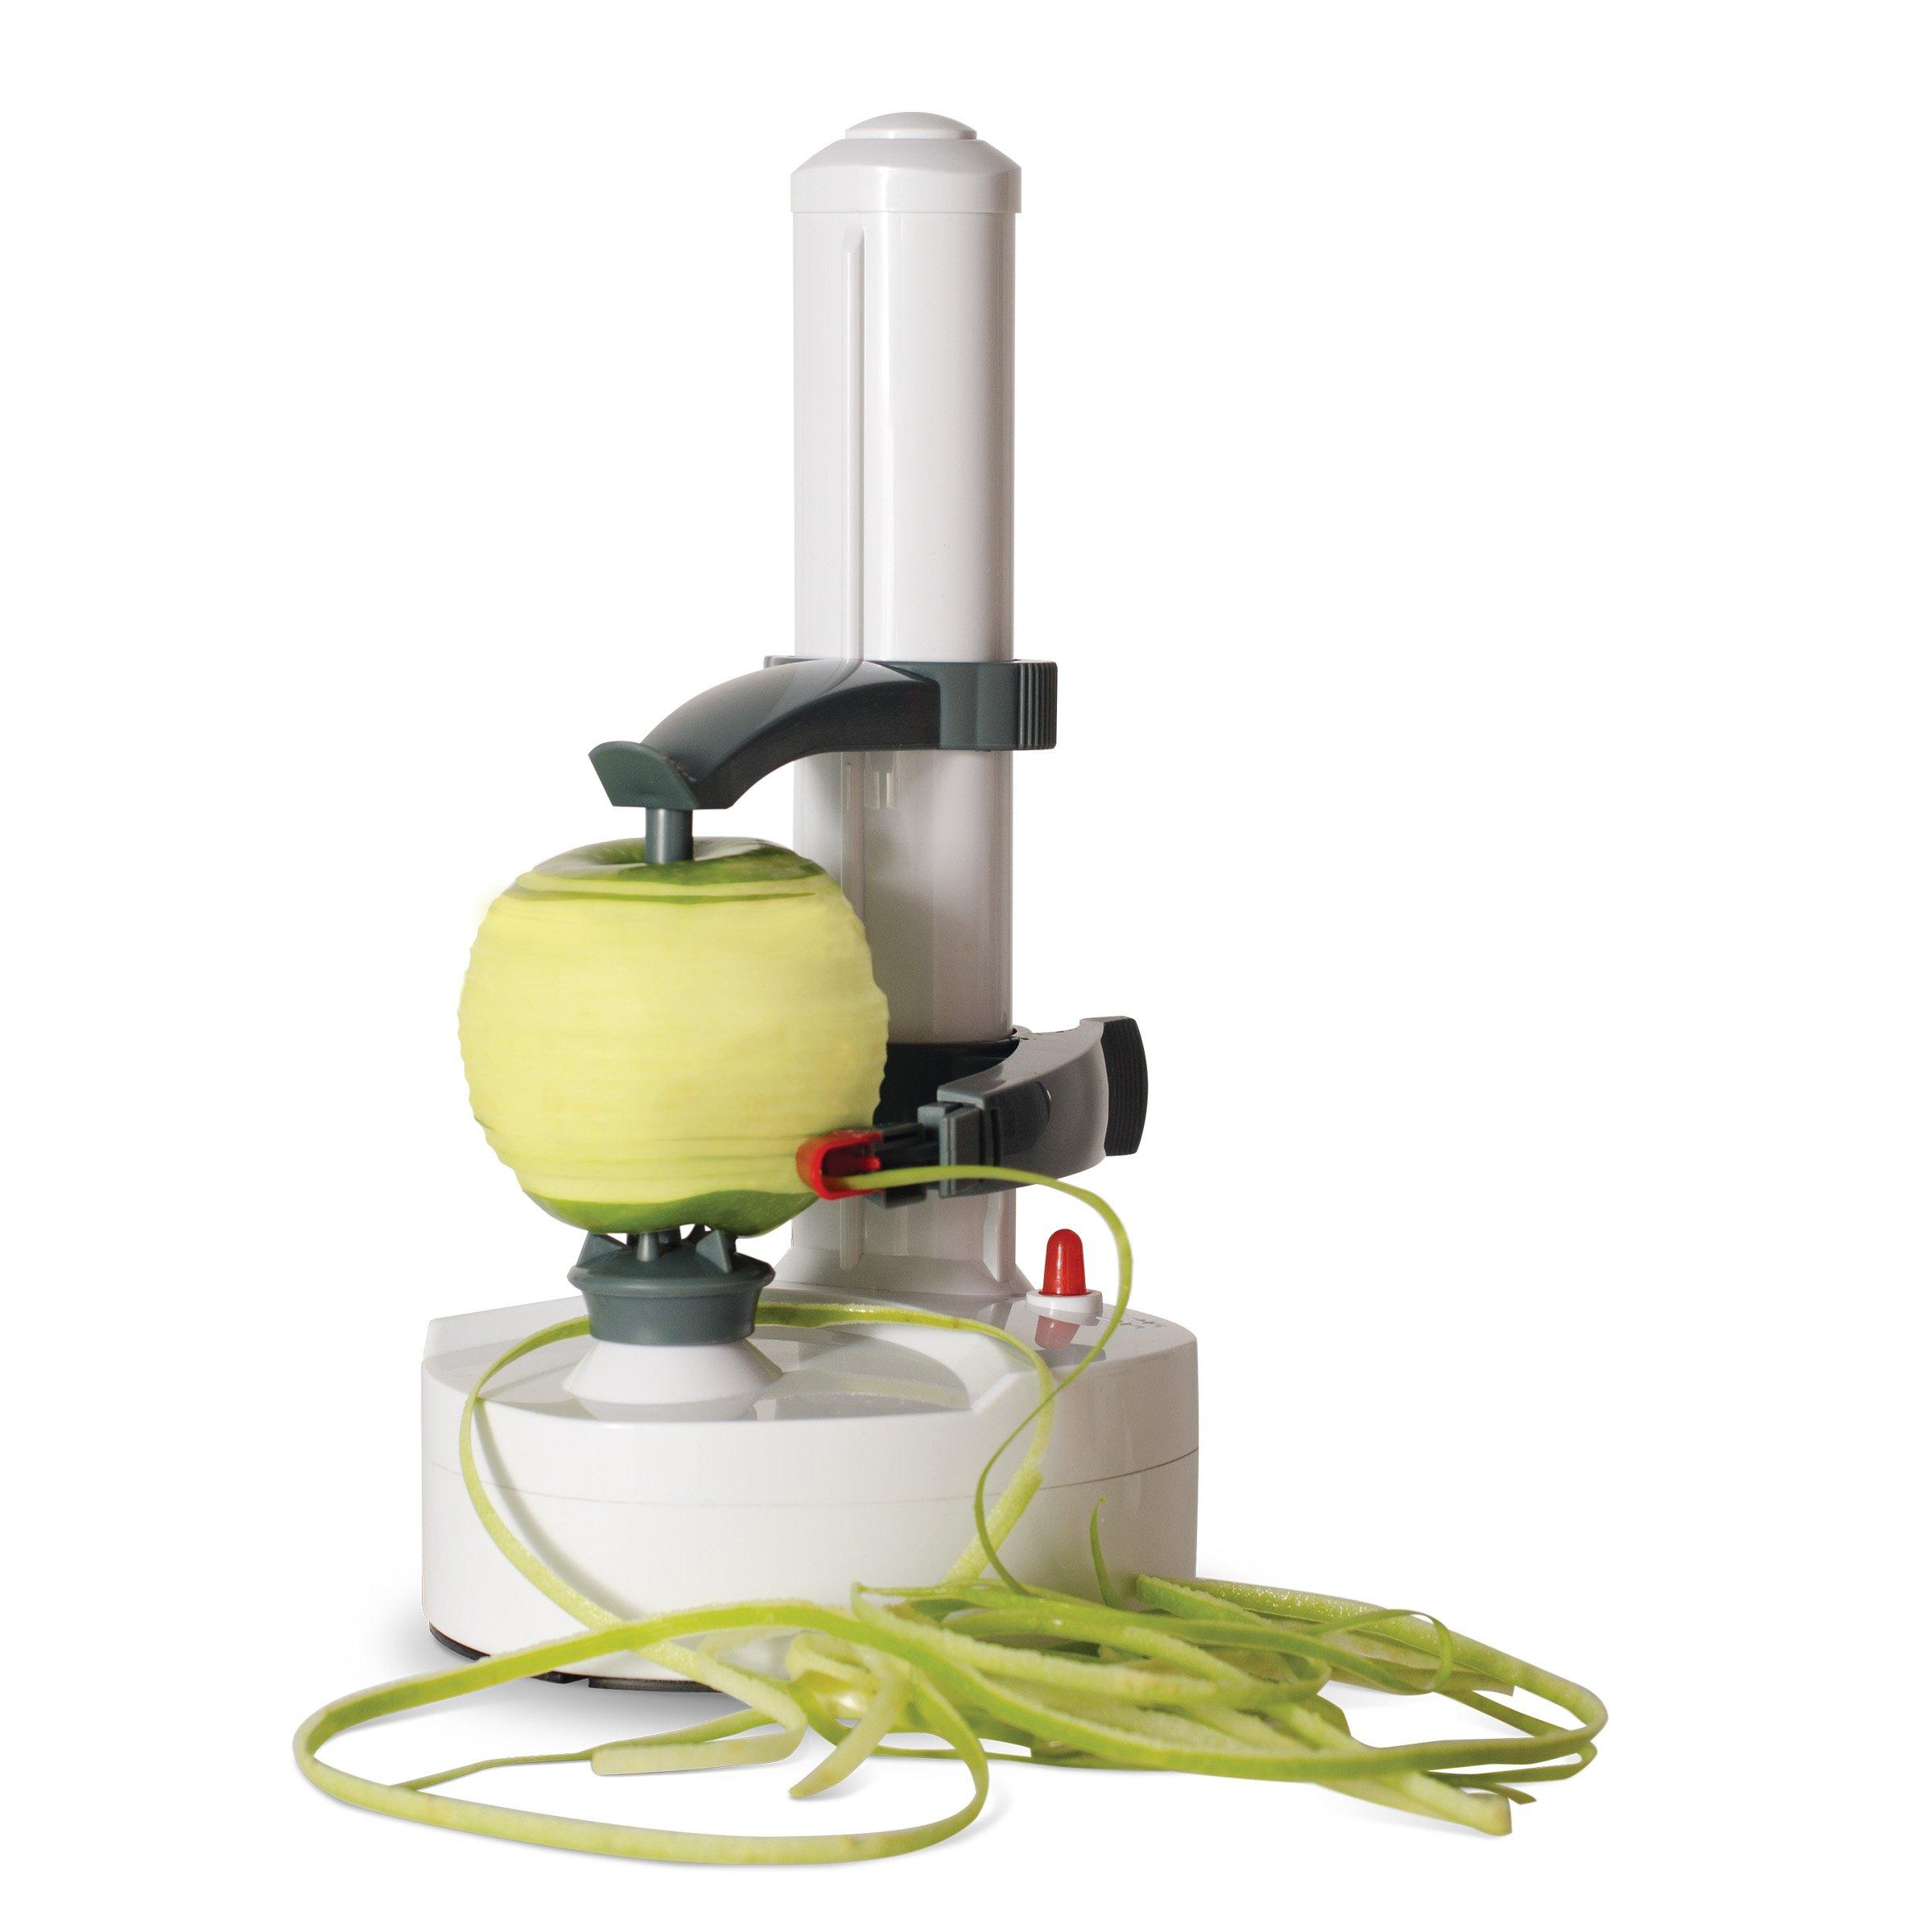 Dash DAP001WA Rapid Electric Potato Peeler Tool + Fruit Skinner with BPA Free Plastic, Auto Shut Off Function, 2 Replacement Blades, Paring Utensil, Recipe Book, White